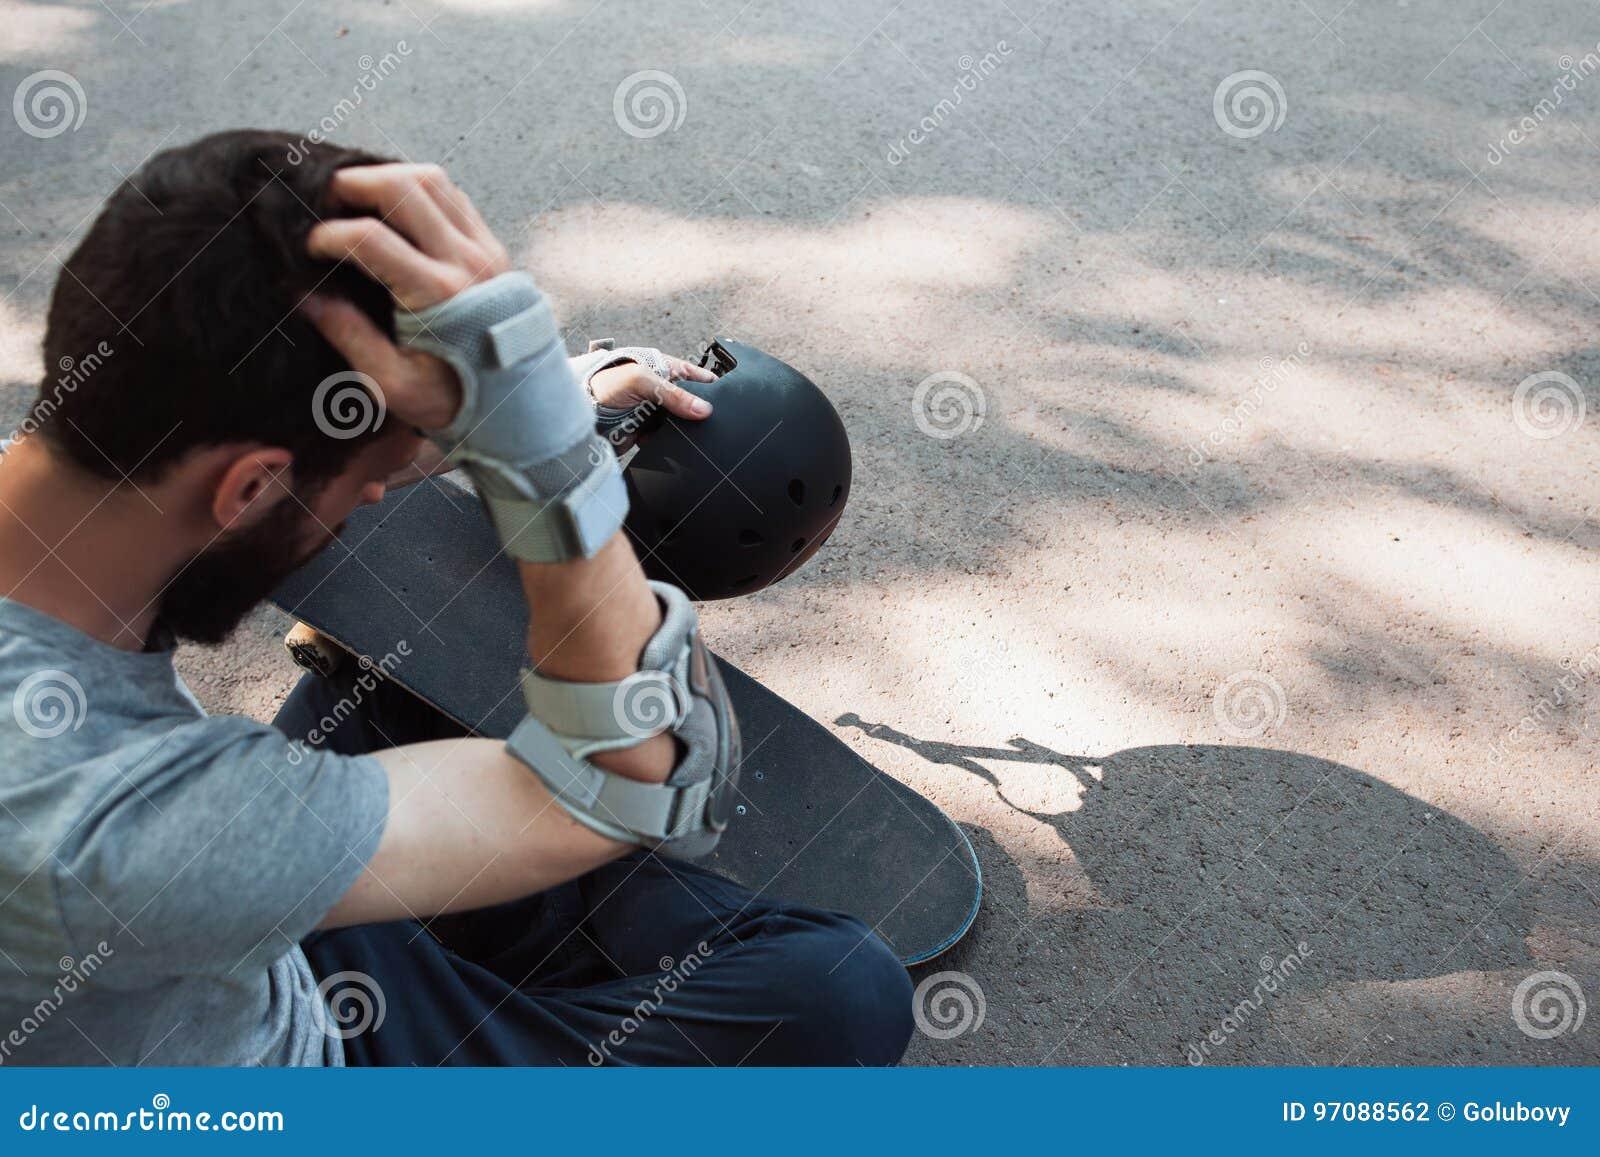 Extreme sport painful injury. Head trauma accident